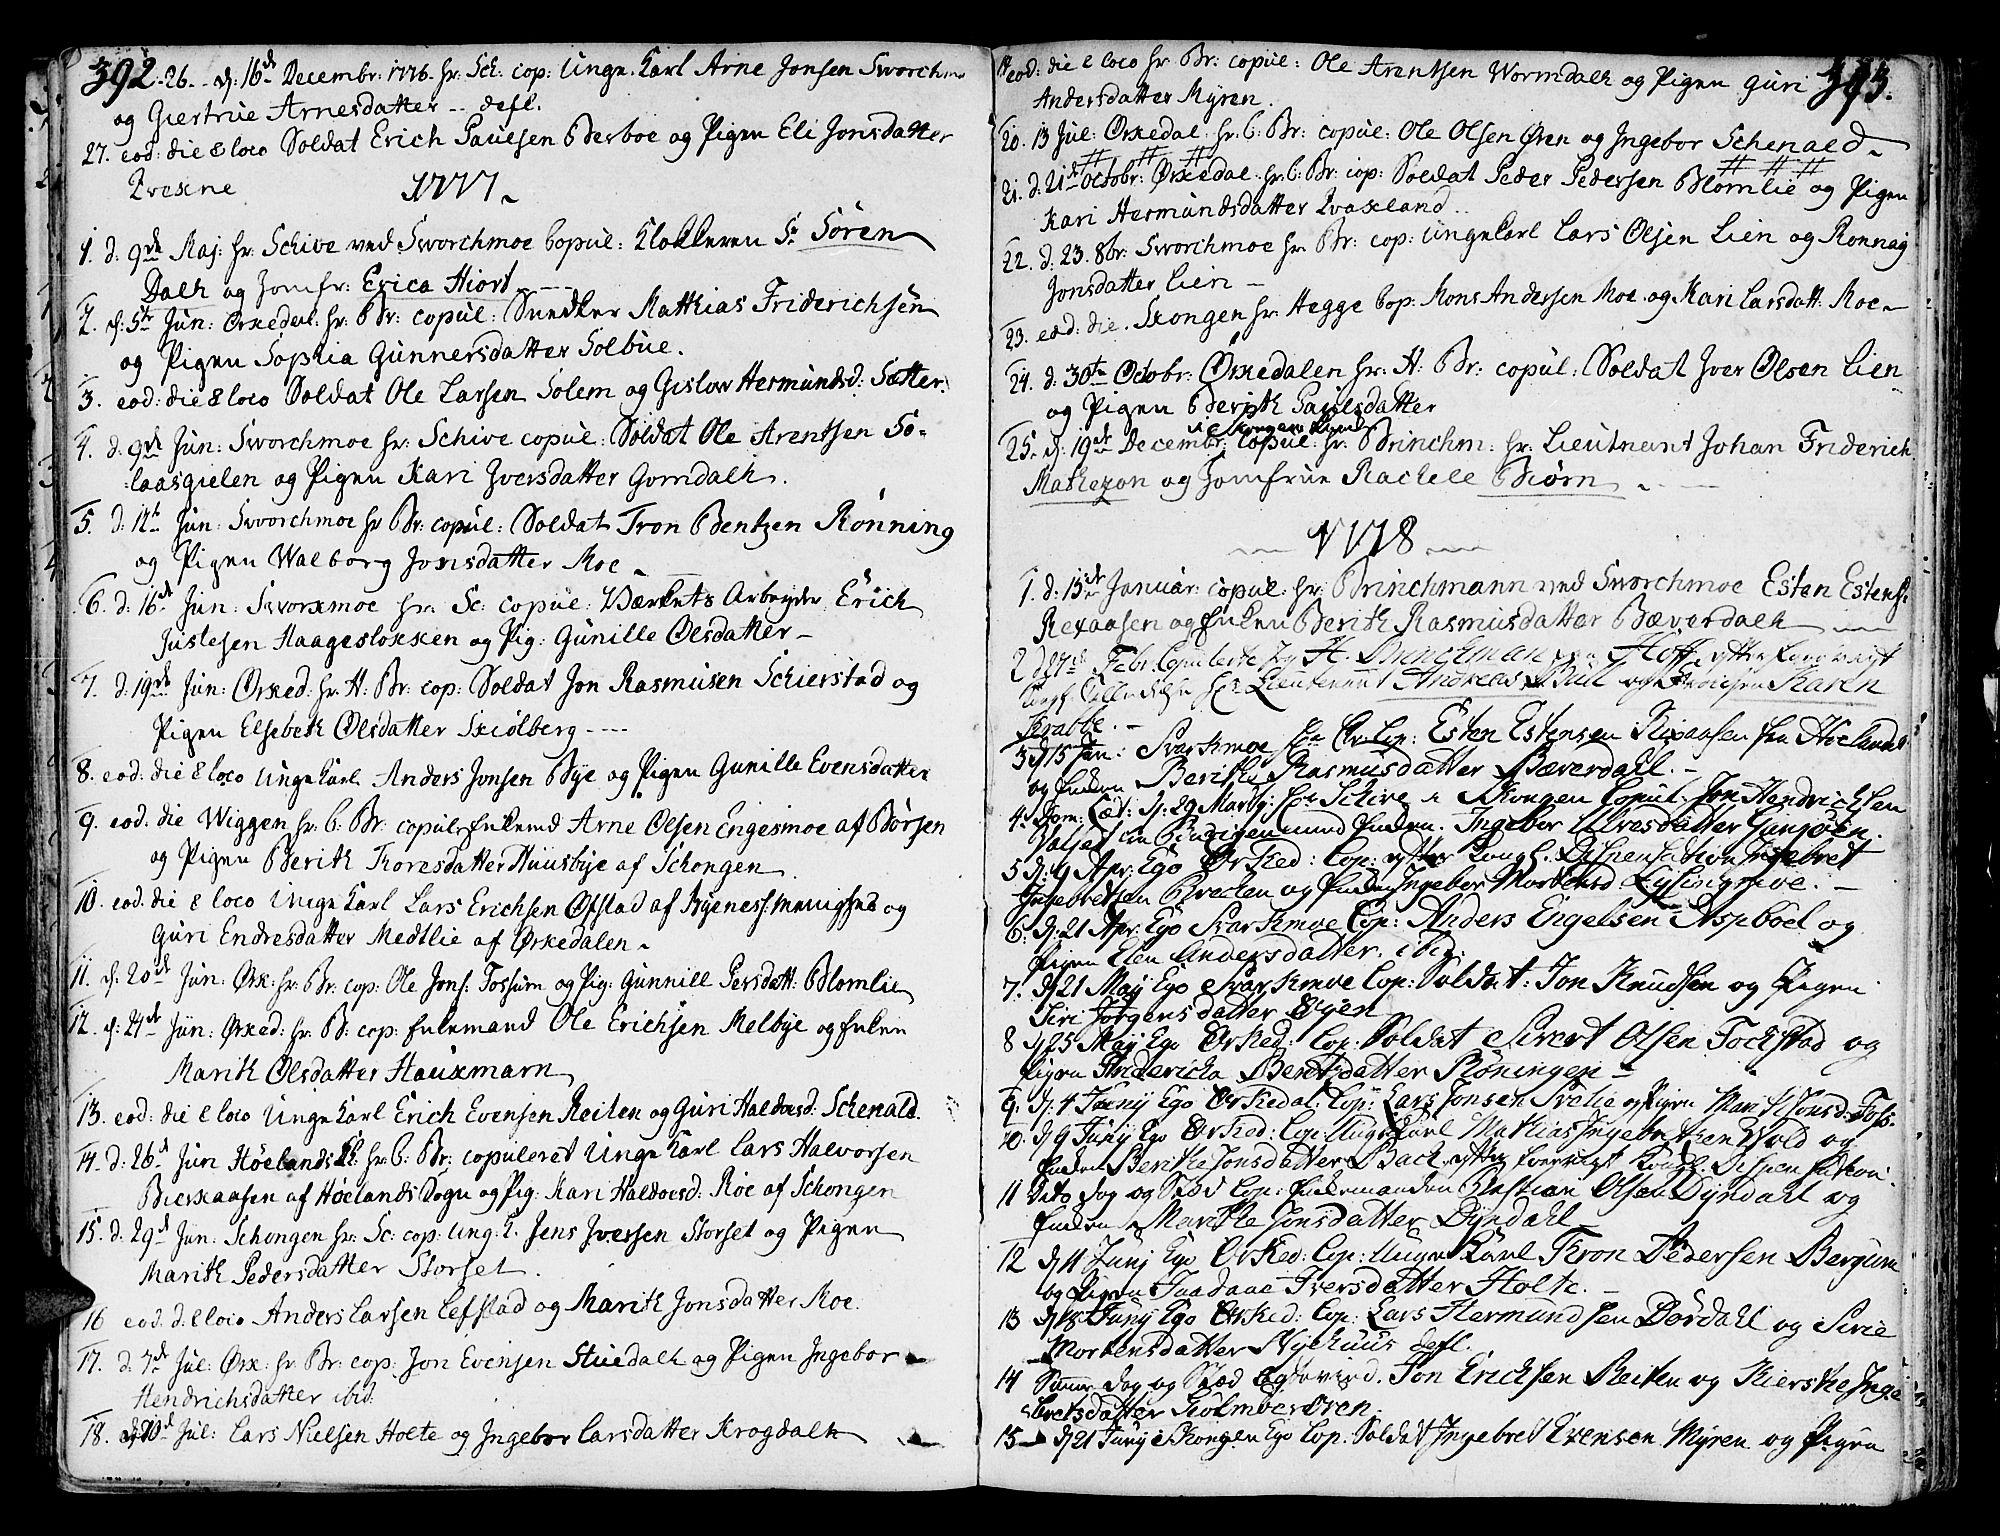 SAT, Ministerialprotokoller, klokkerbøker og fødselsregistre - Sør-Trøndelag, 668/L0802: Parish register (official) no. 668A02, 1776-1799, p. 392-393